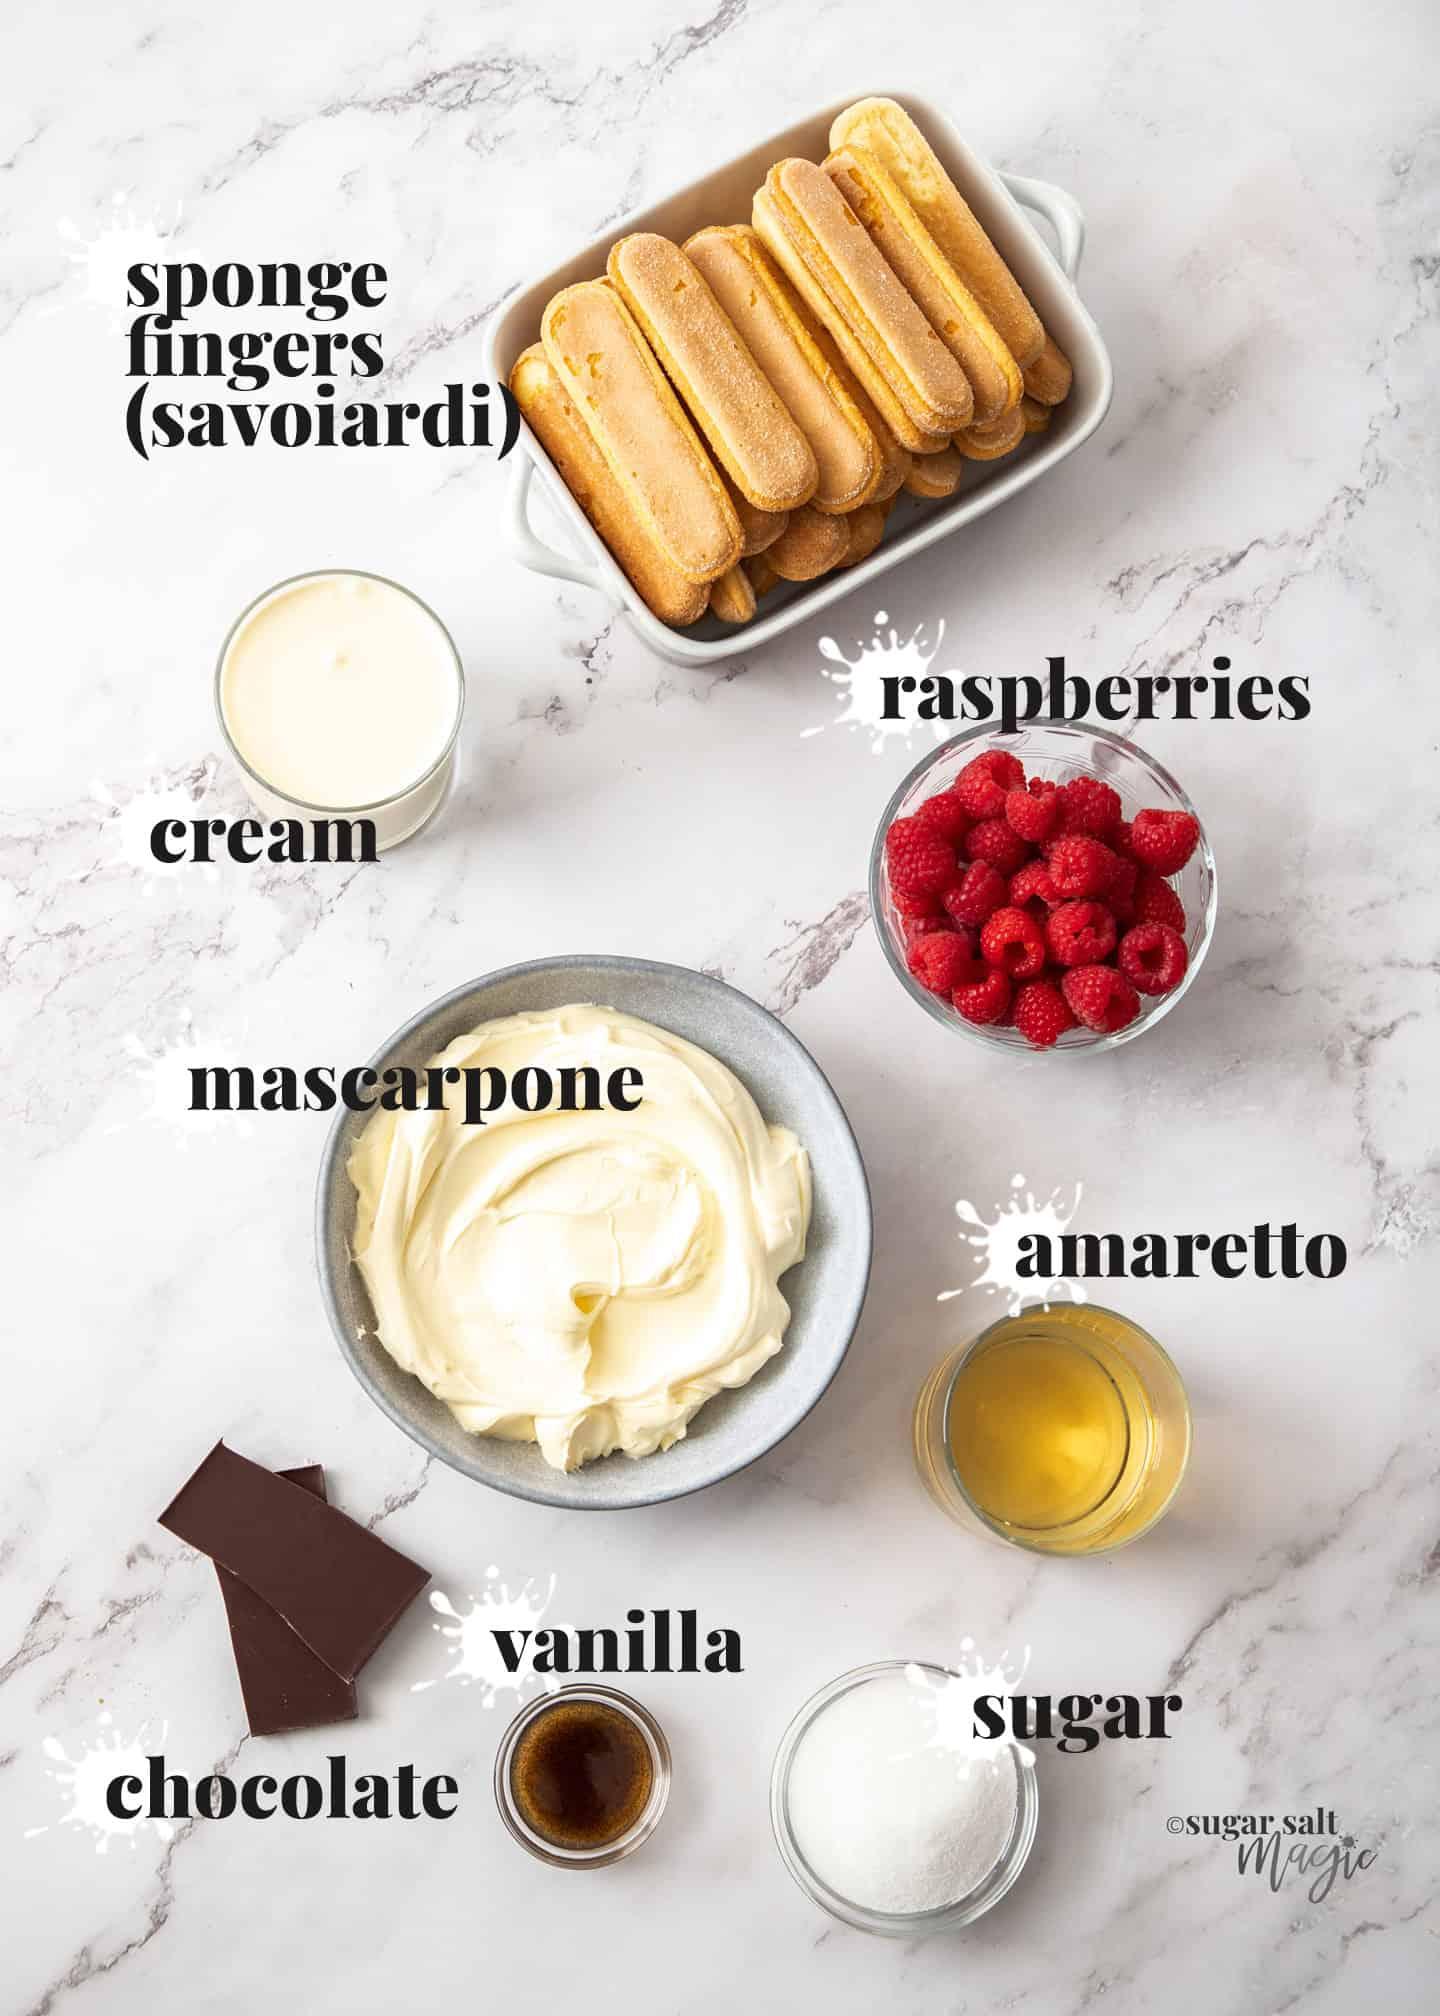 Ingredients for raspberry tiramisu on a marble background.